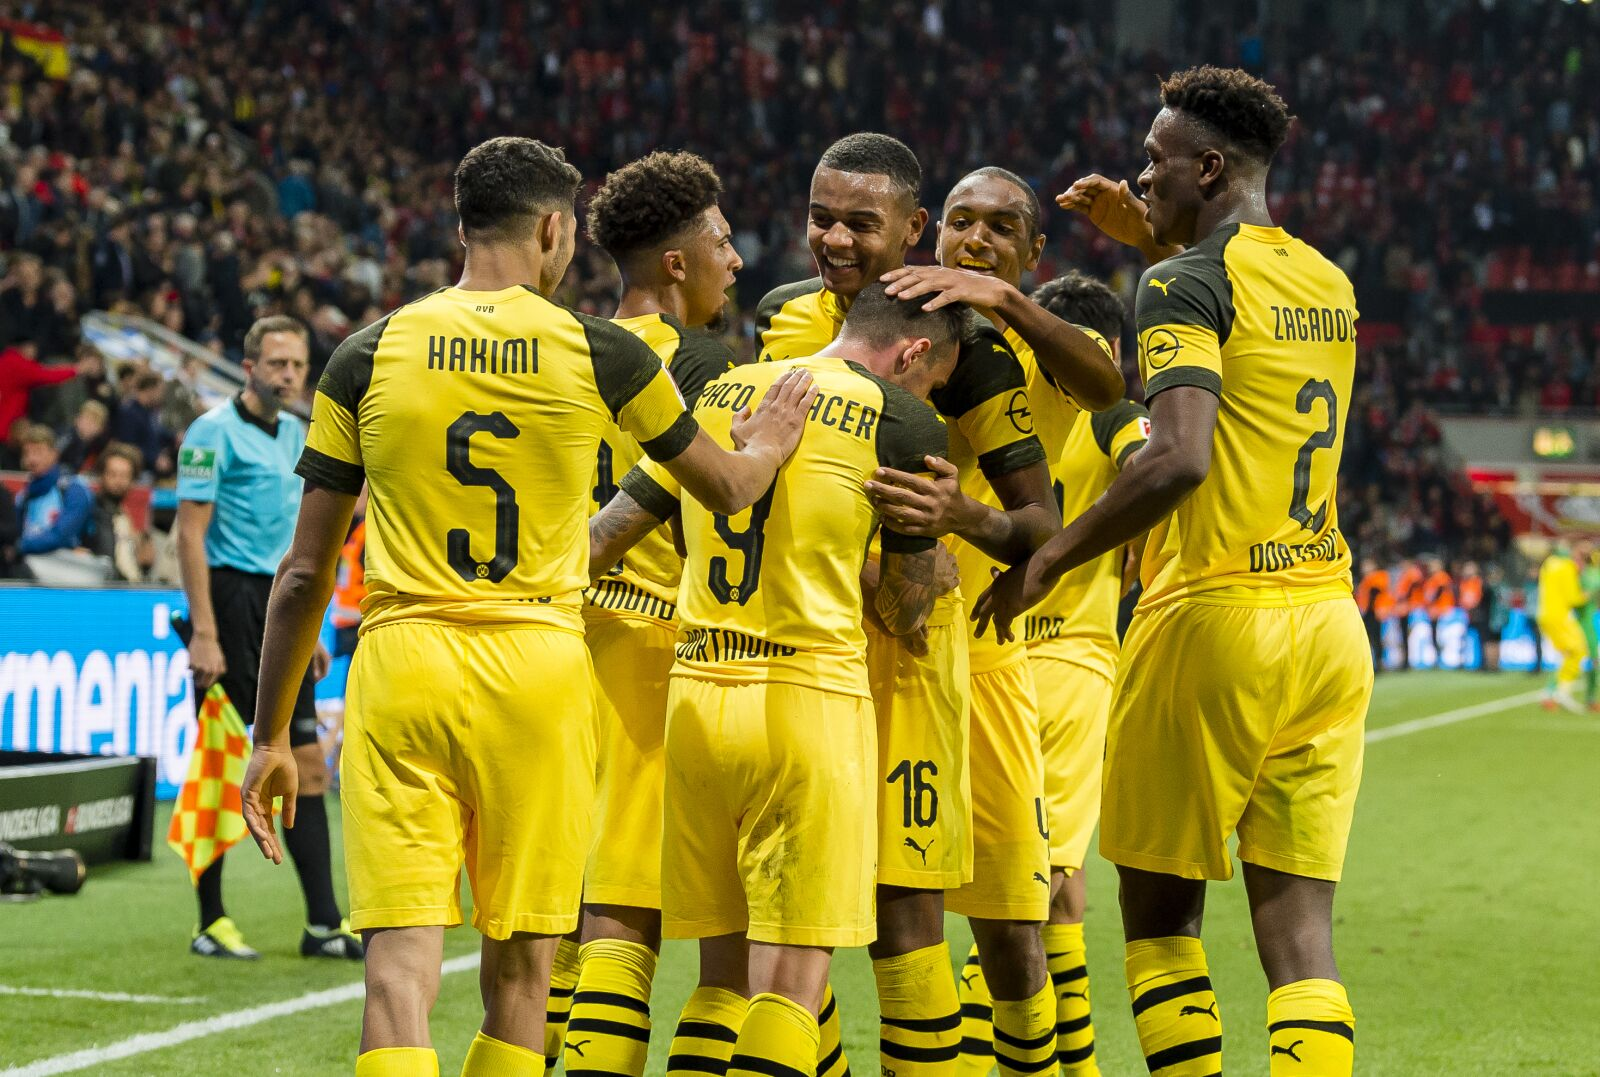 Cl Gruppe Dortmund